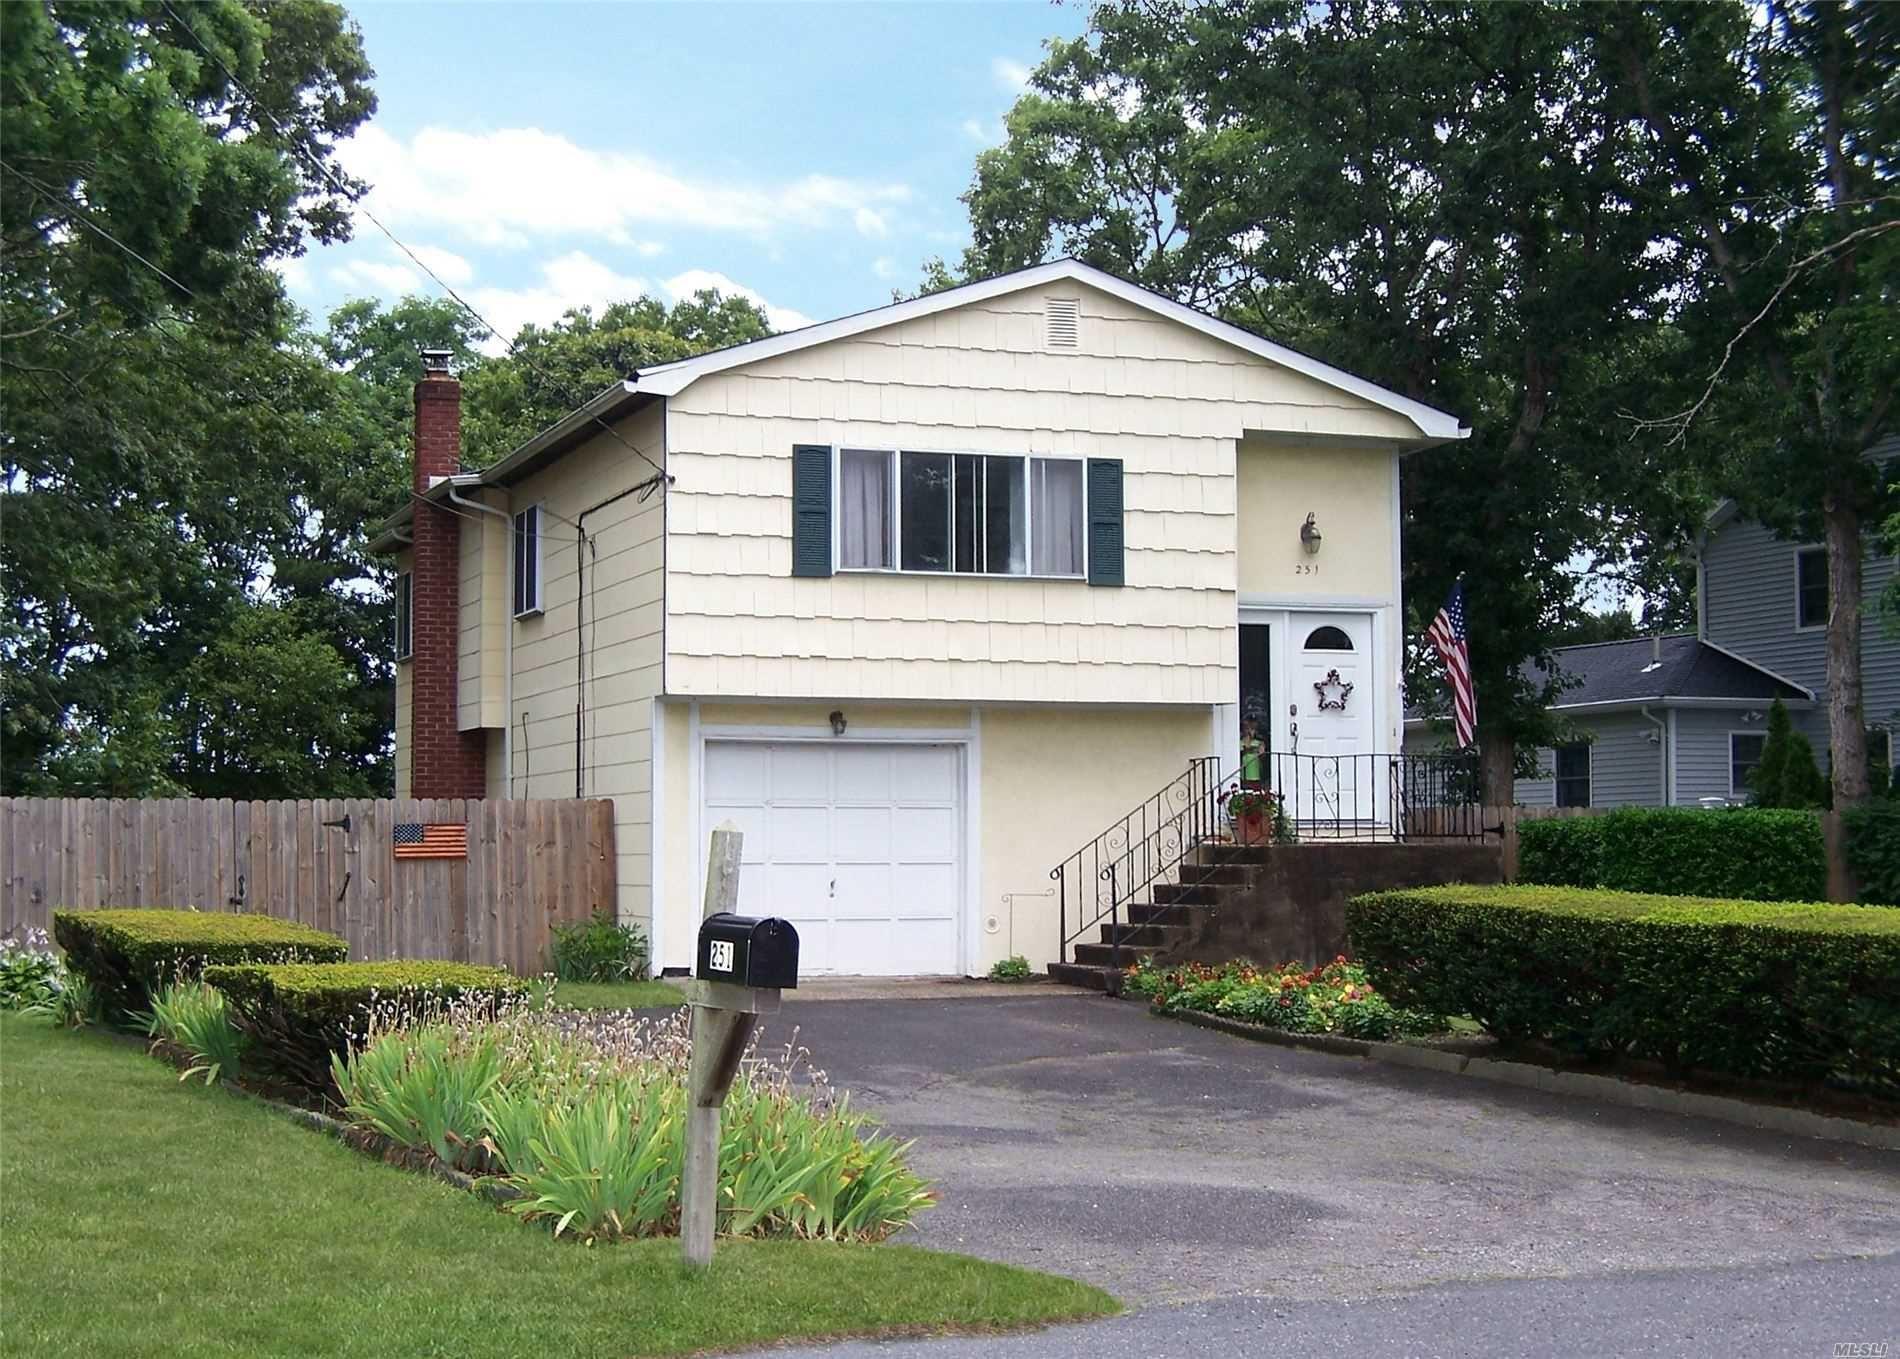 251 Floyd Rd, Shirley, NY 11967 - MLS#: 3236760